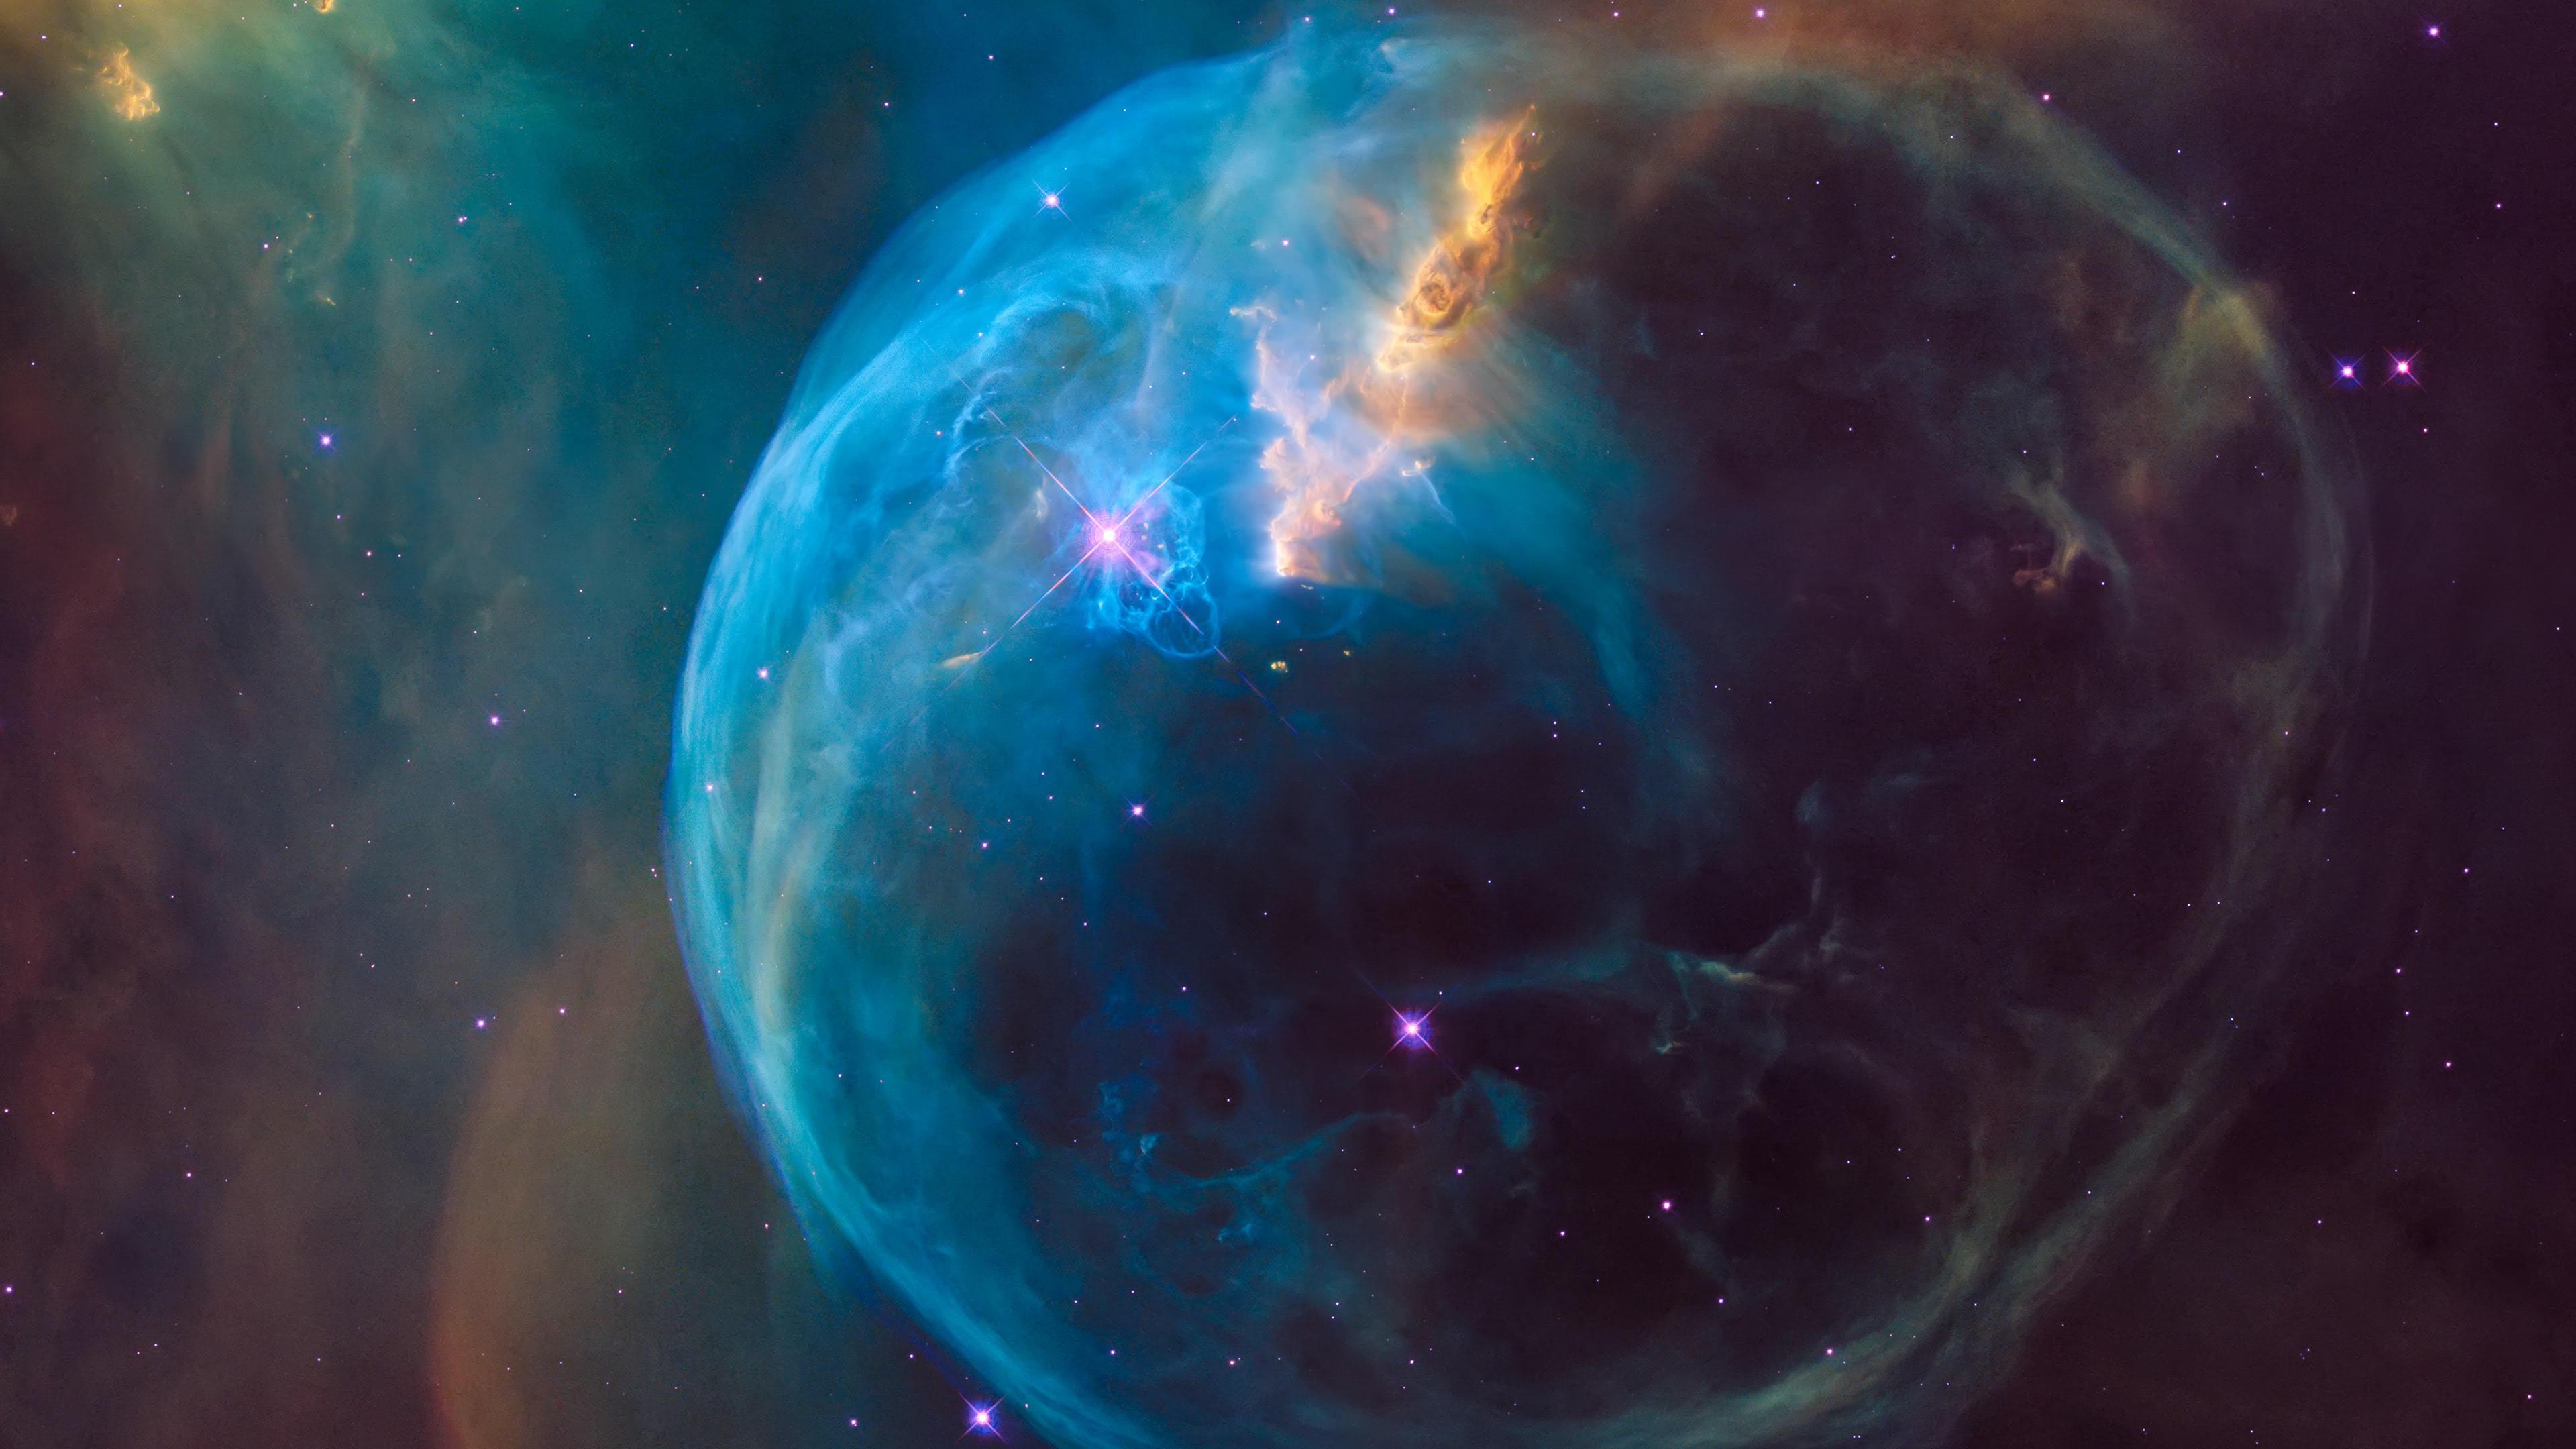 bubble nebula ngc 7635 uhd 4k wallpaper